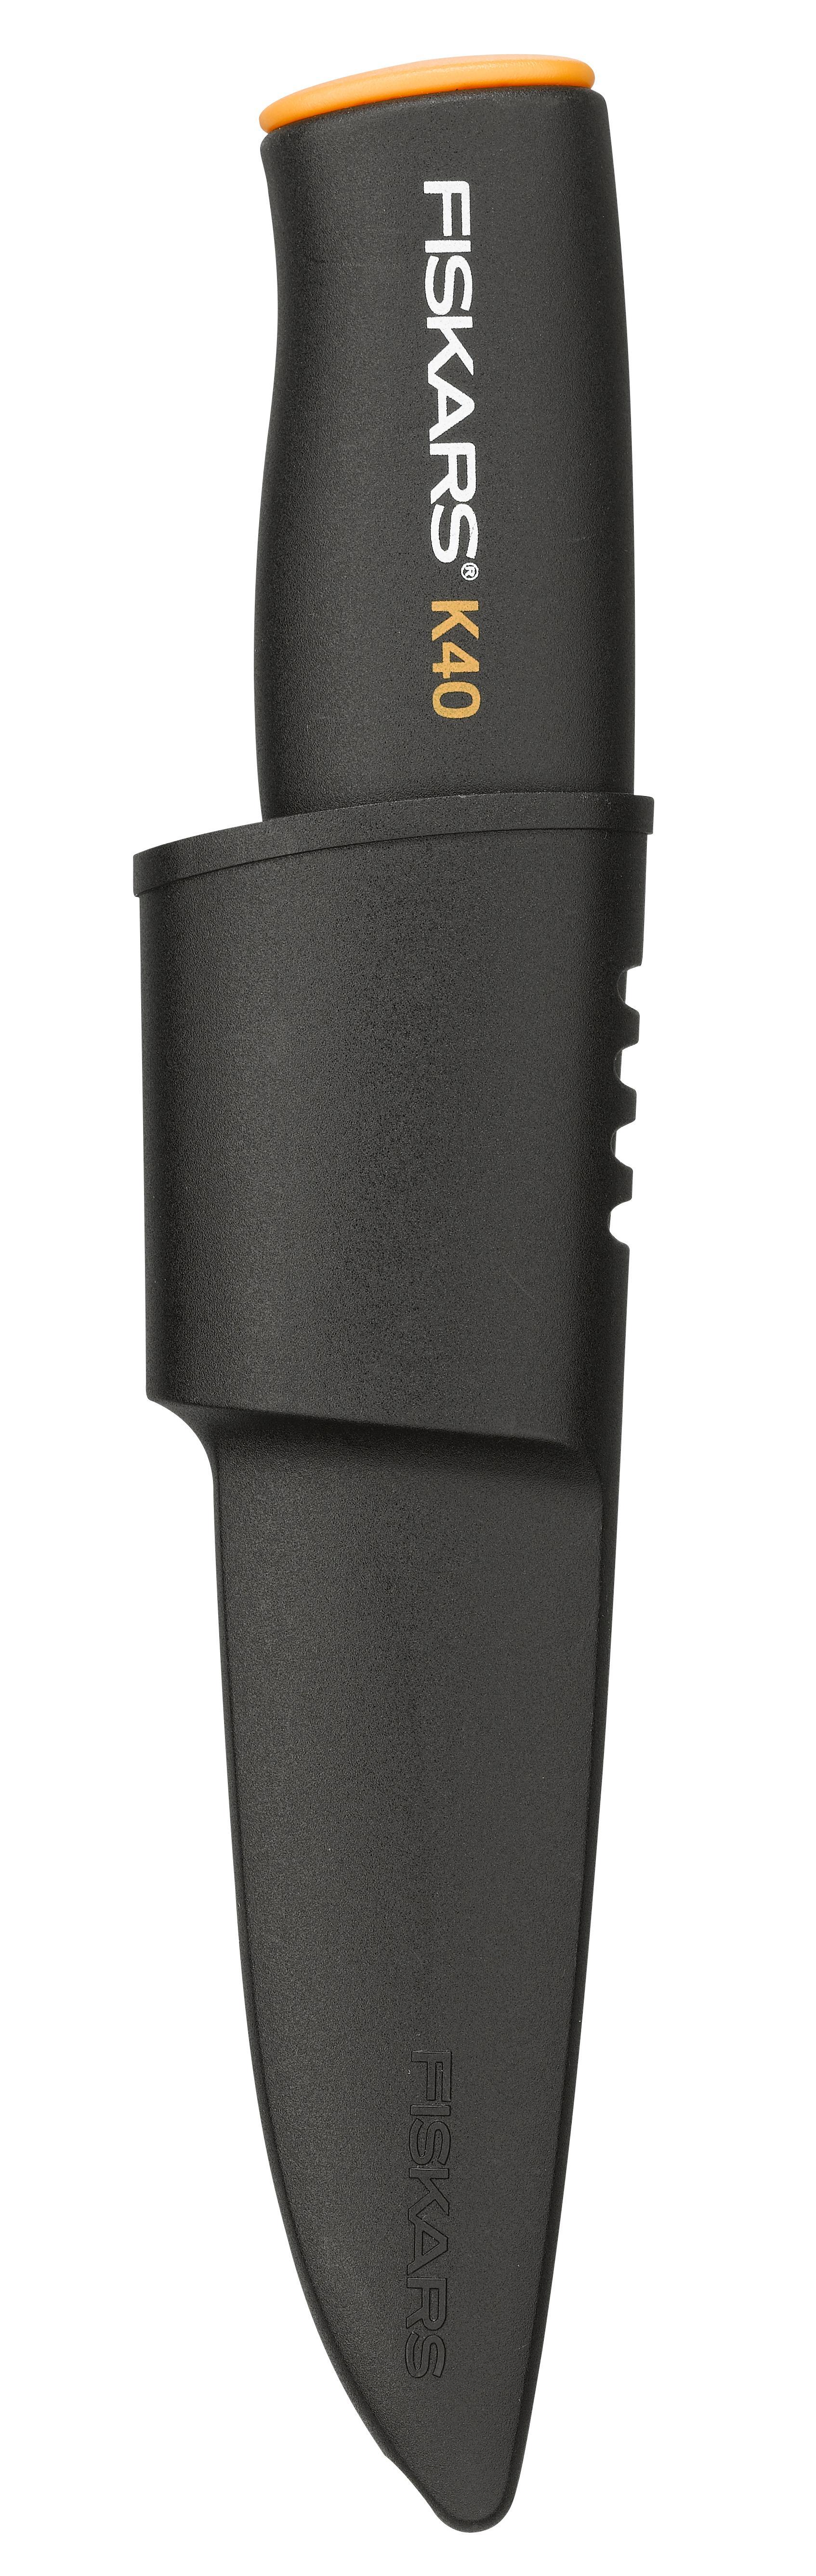 Нож-поплавок Fiskars 125860